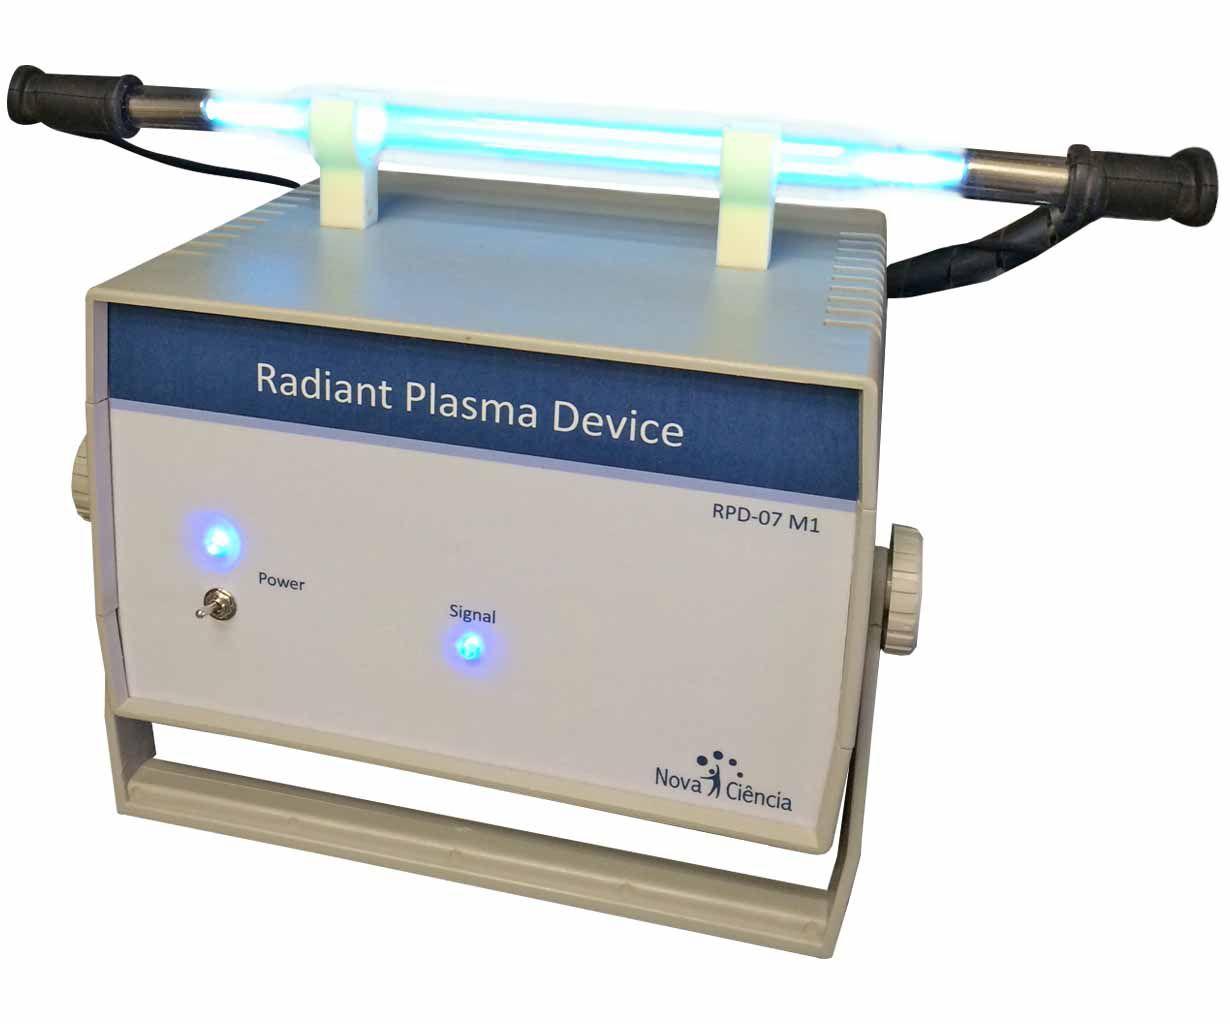 RPD – Emissor de Plasma Radiante